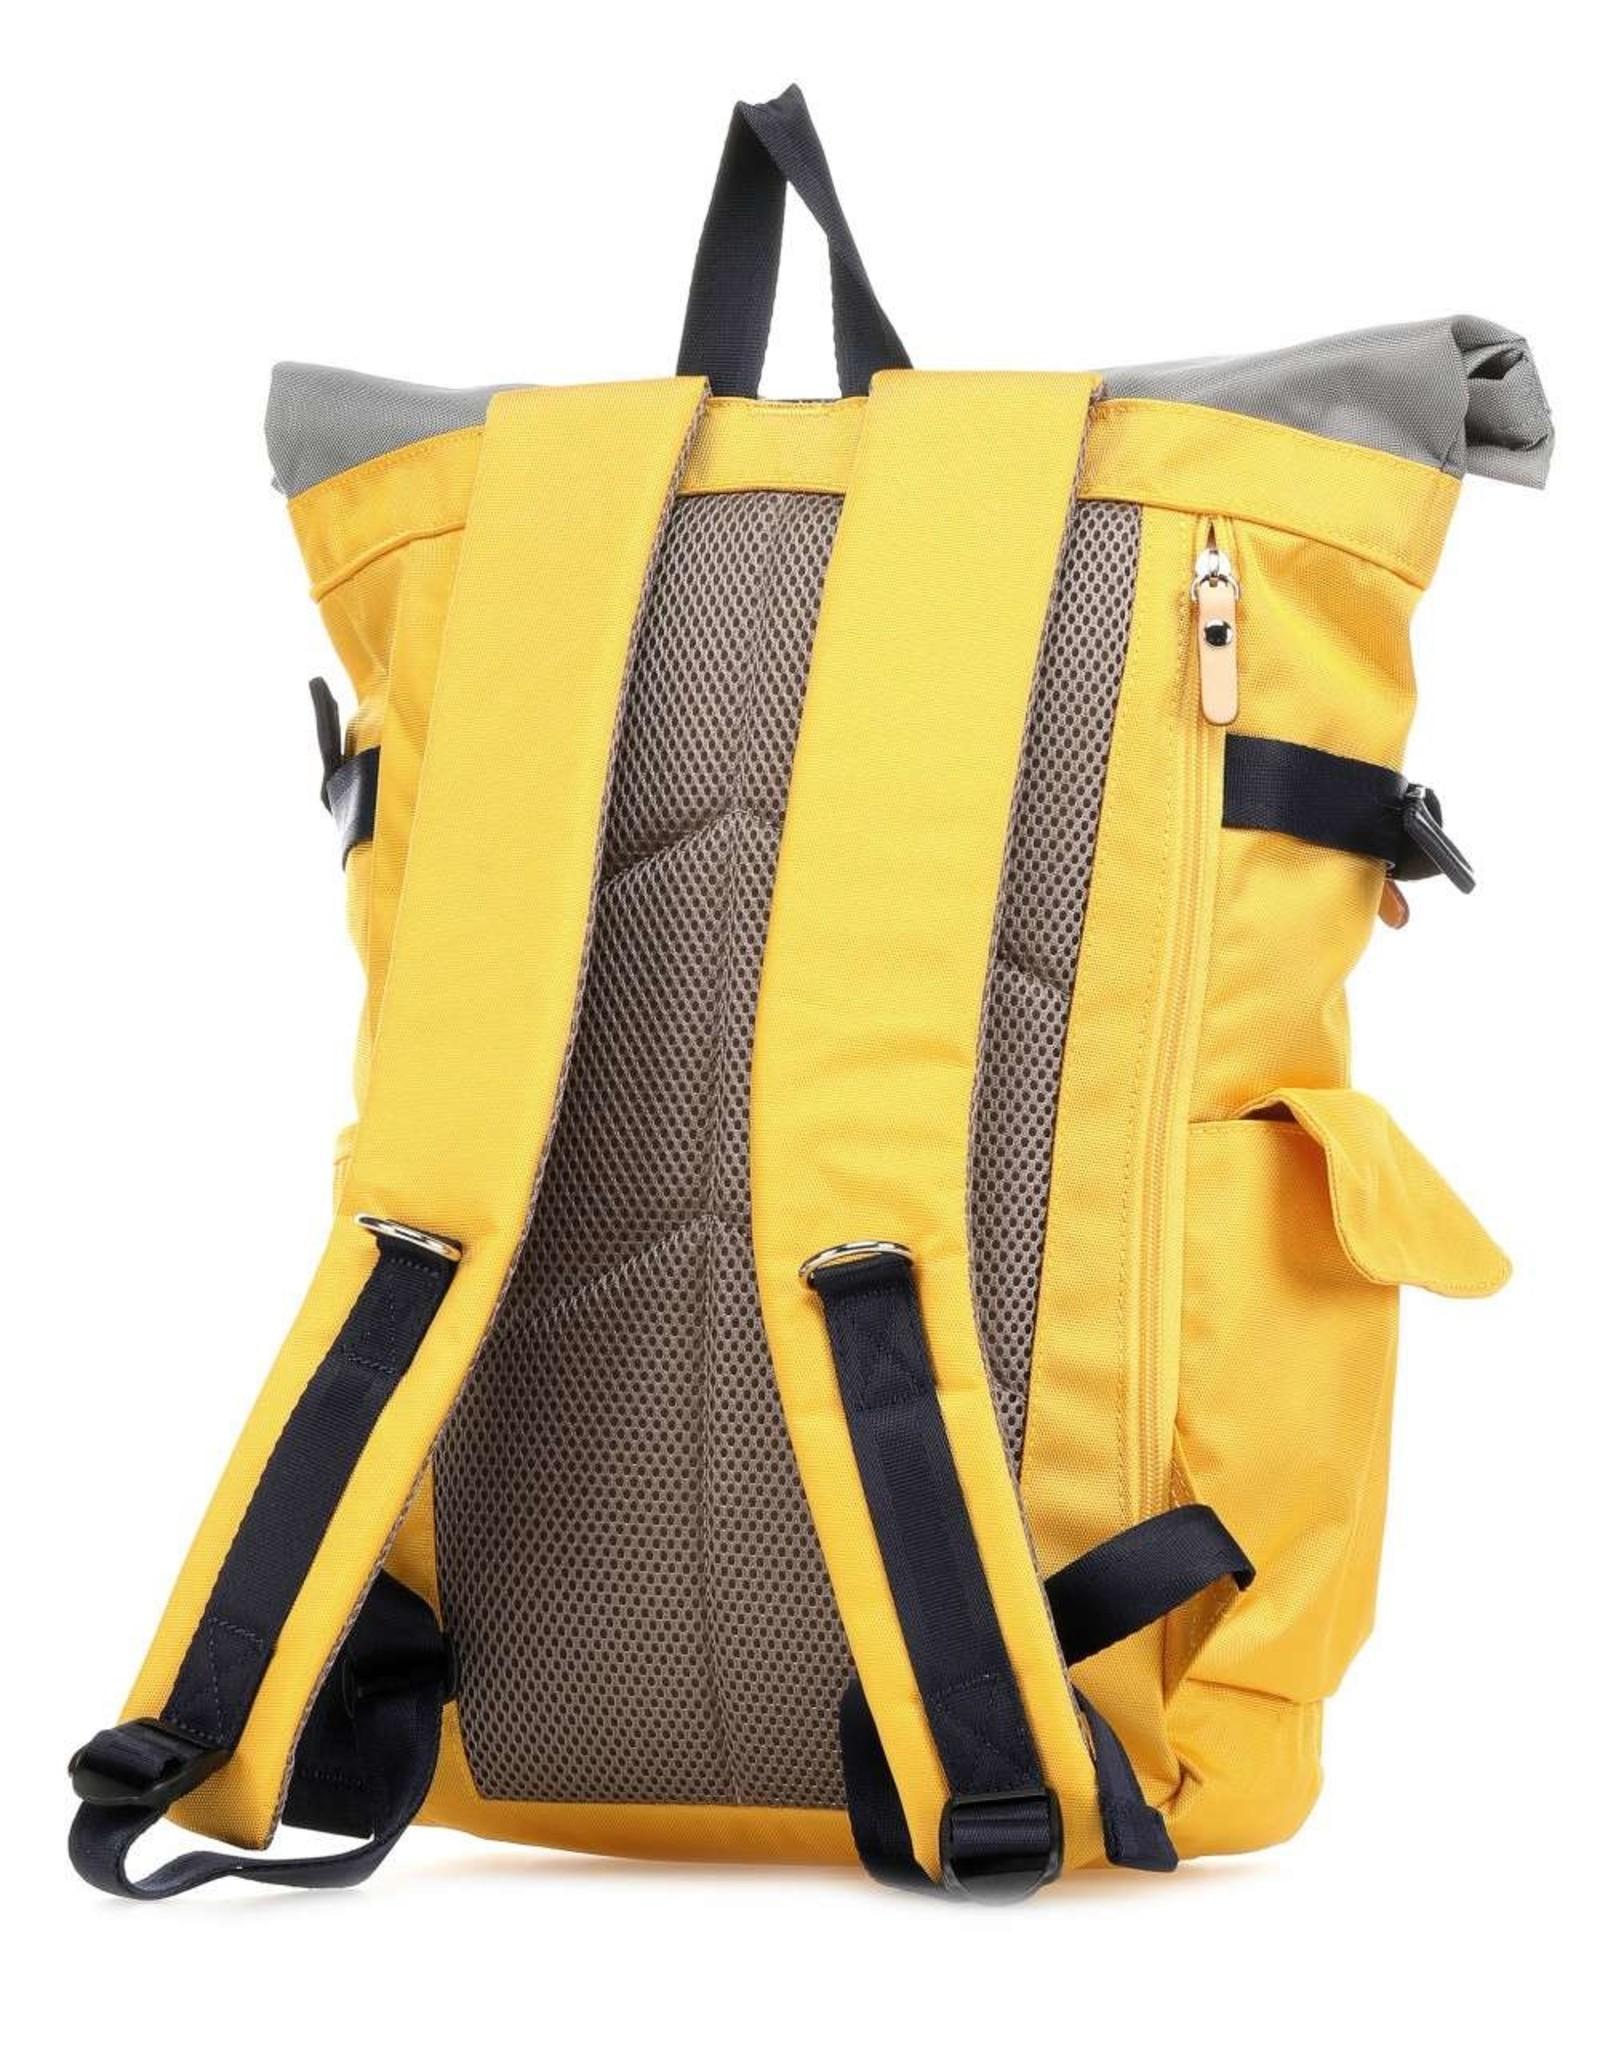 Molla Space Rolltop Backpack 2.0 - Mustard